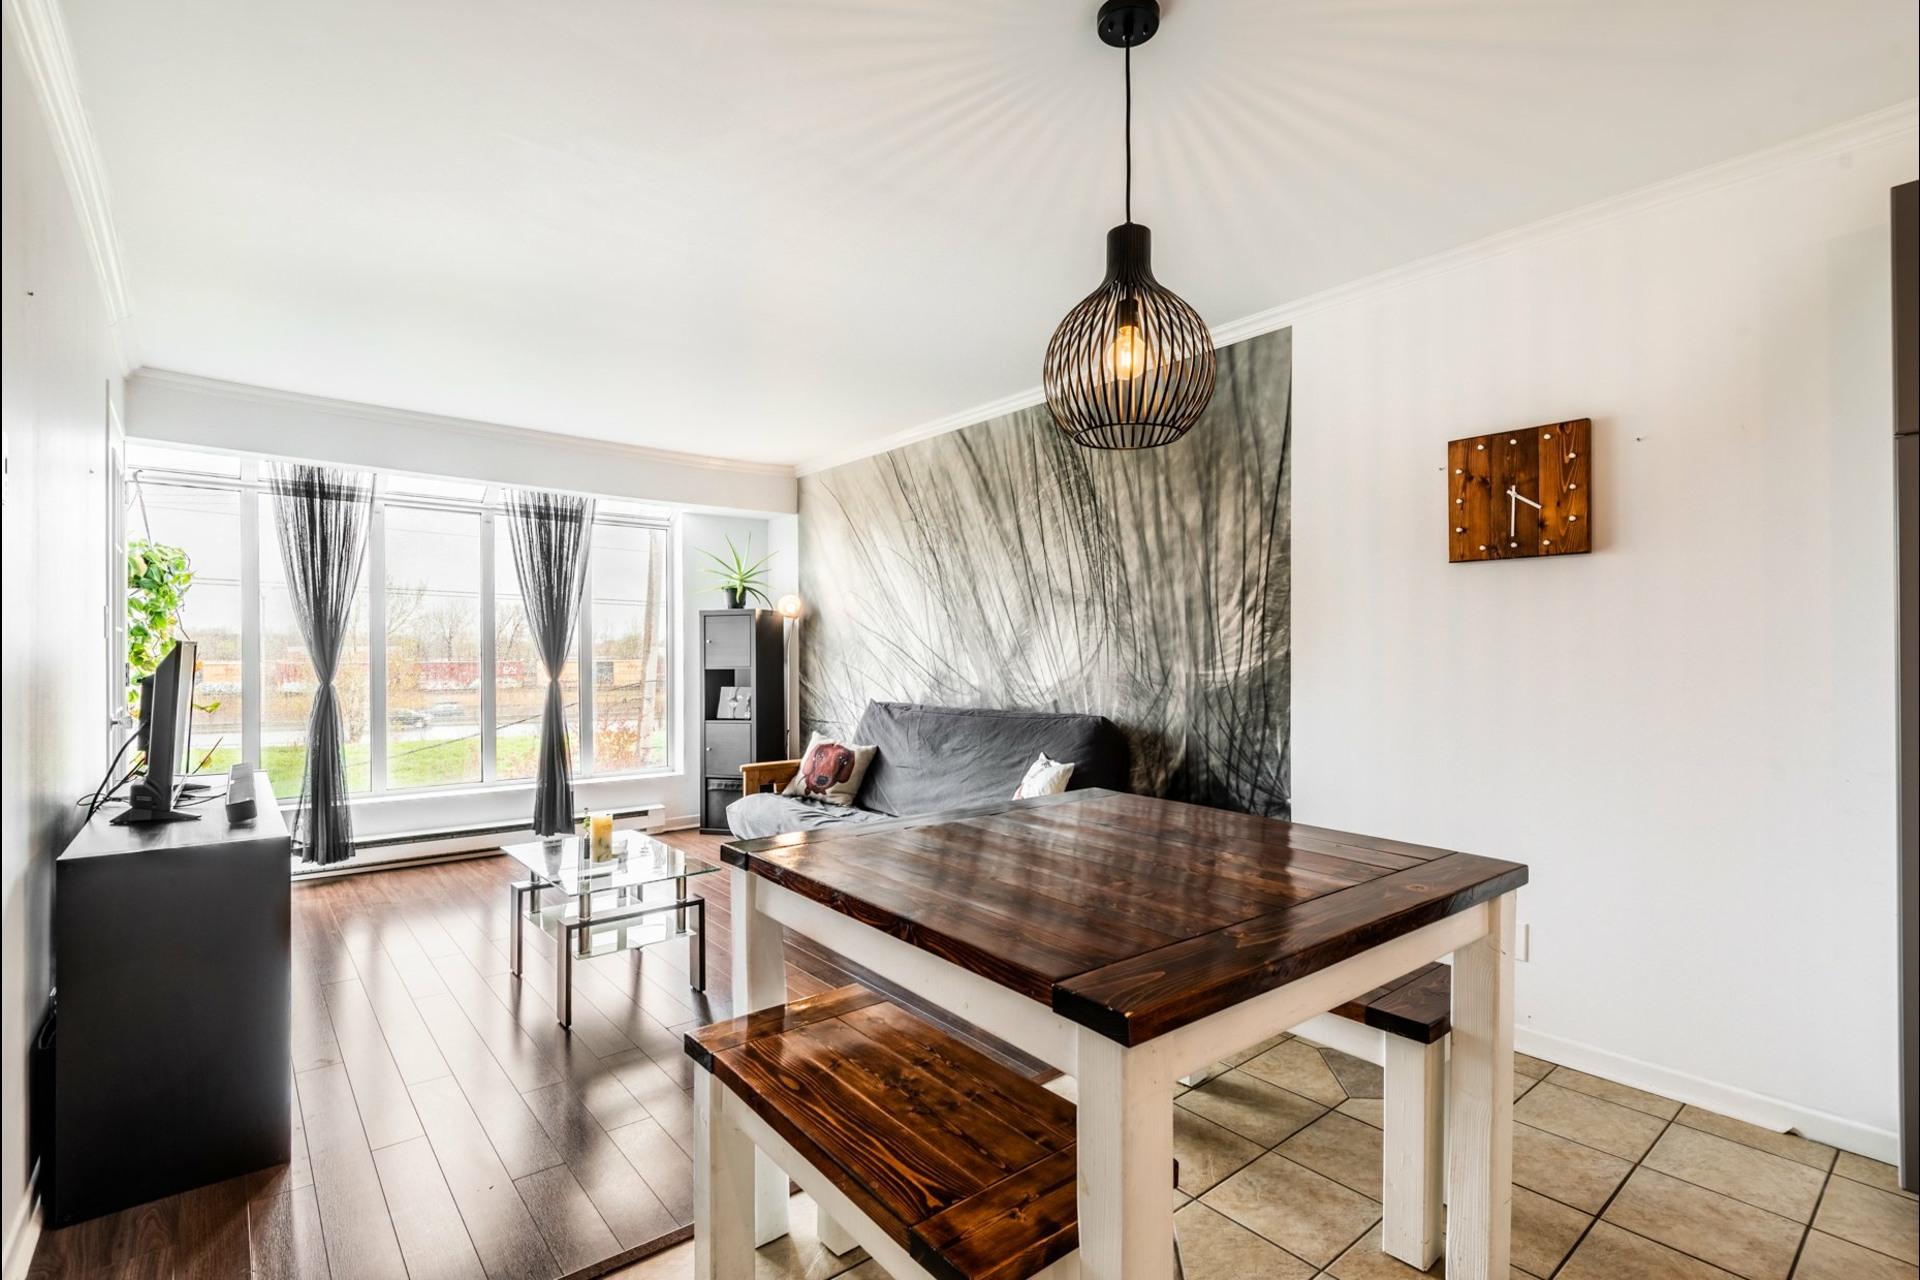 image 8 - Apartment For sale Saint-Hubert Longueuil  - 4 rooms